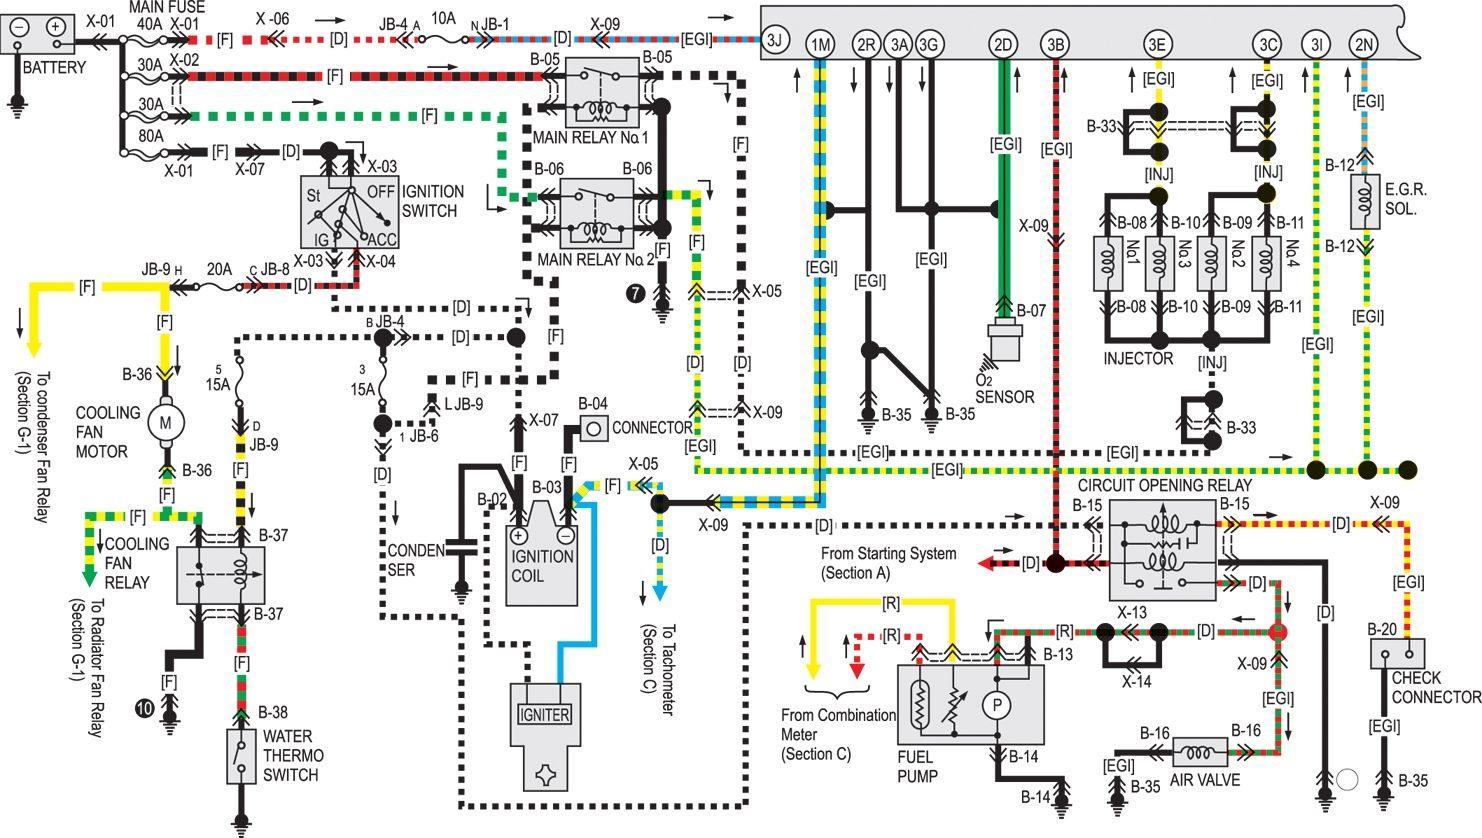 nissan d21 wiring diagram toyota celica wiring diagram elsavadorla